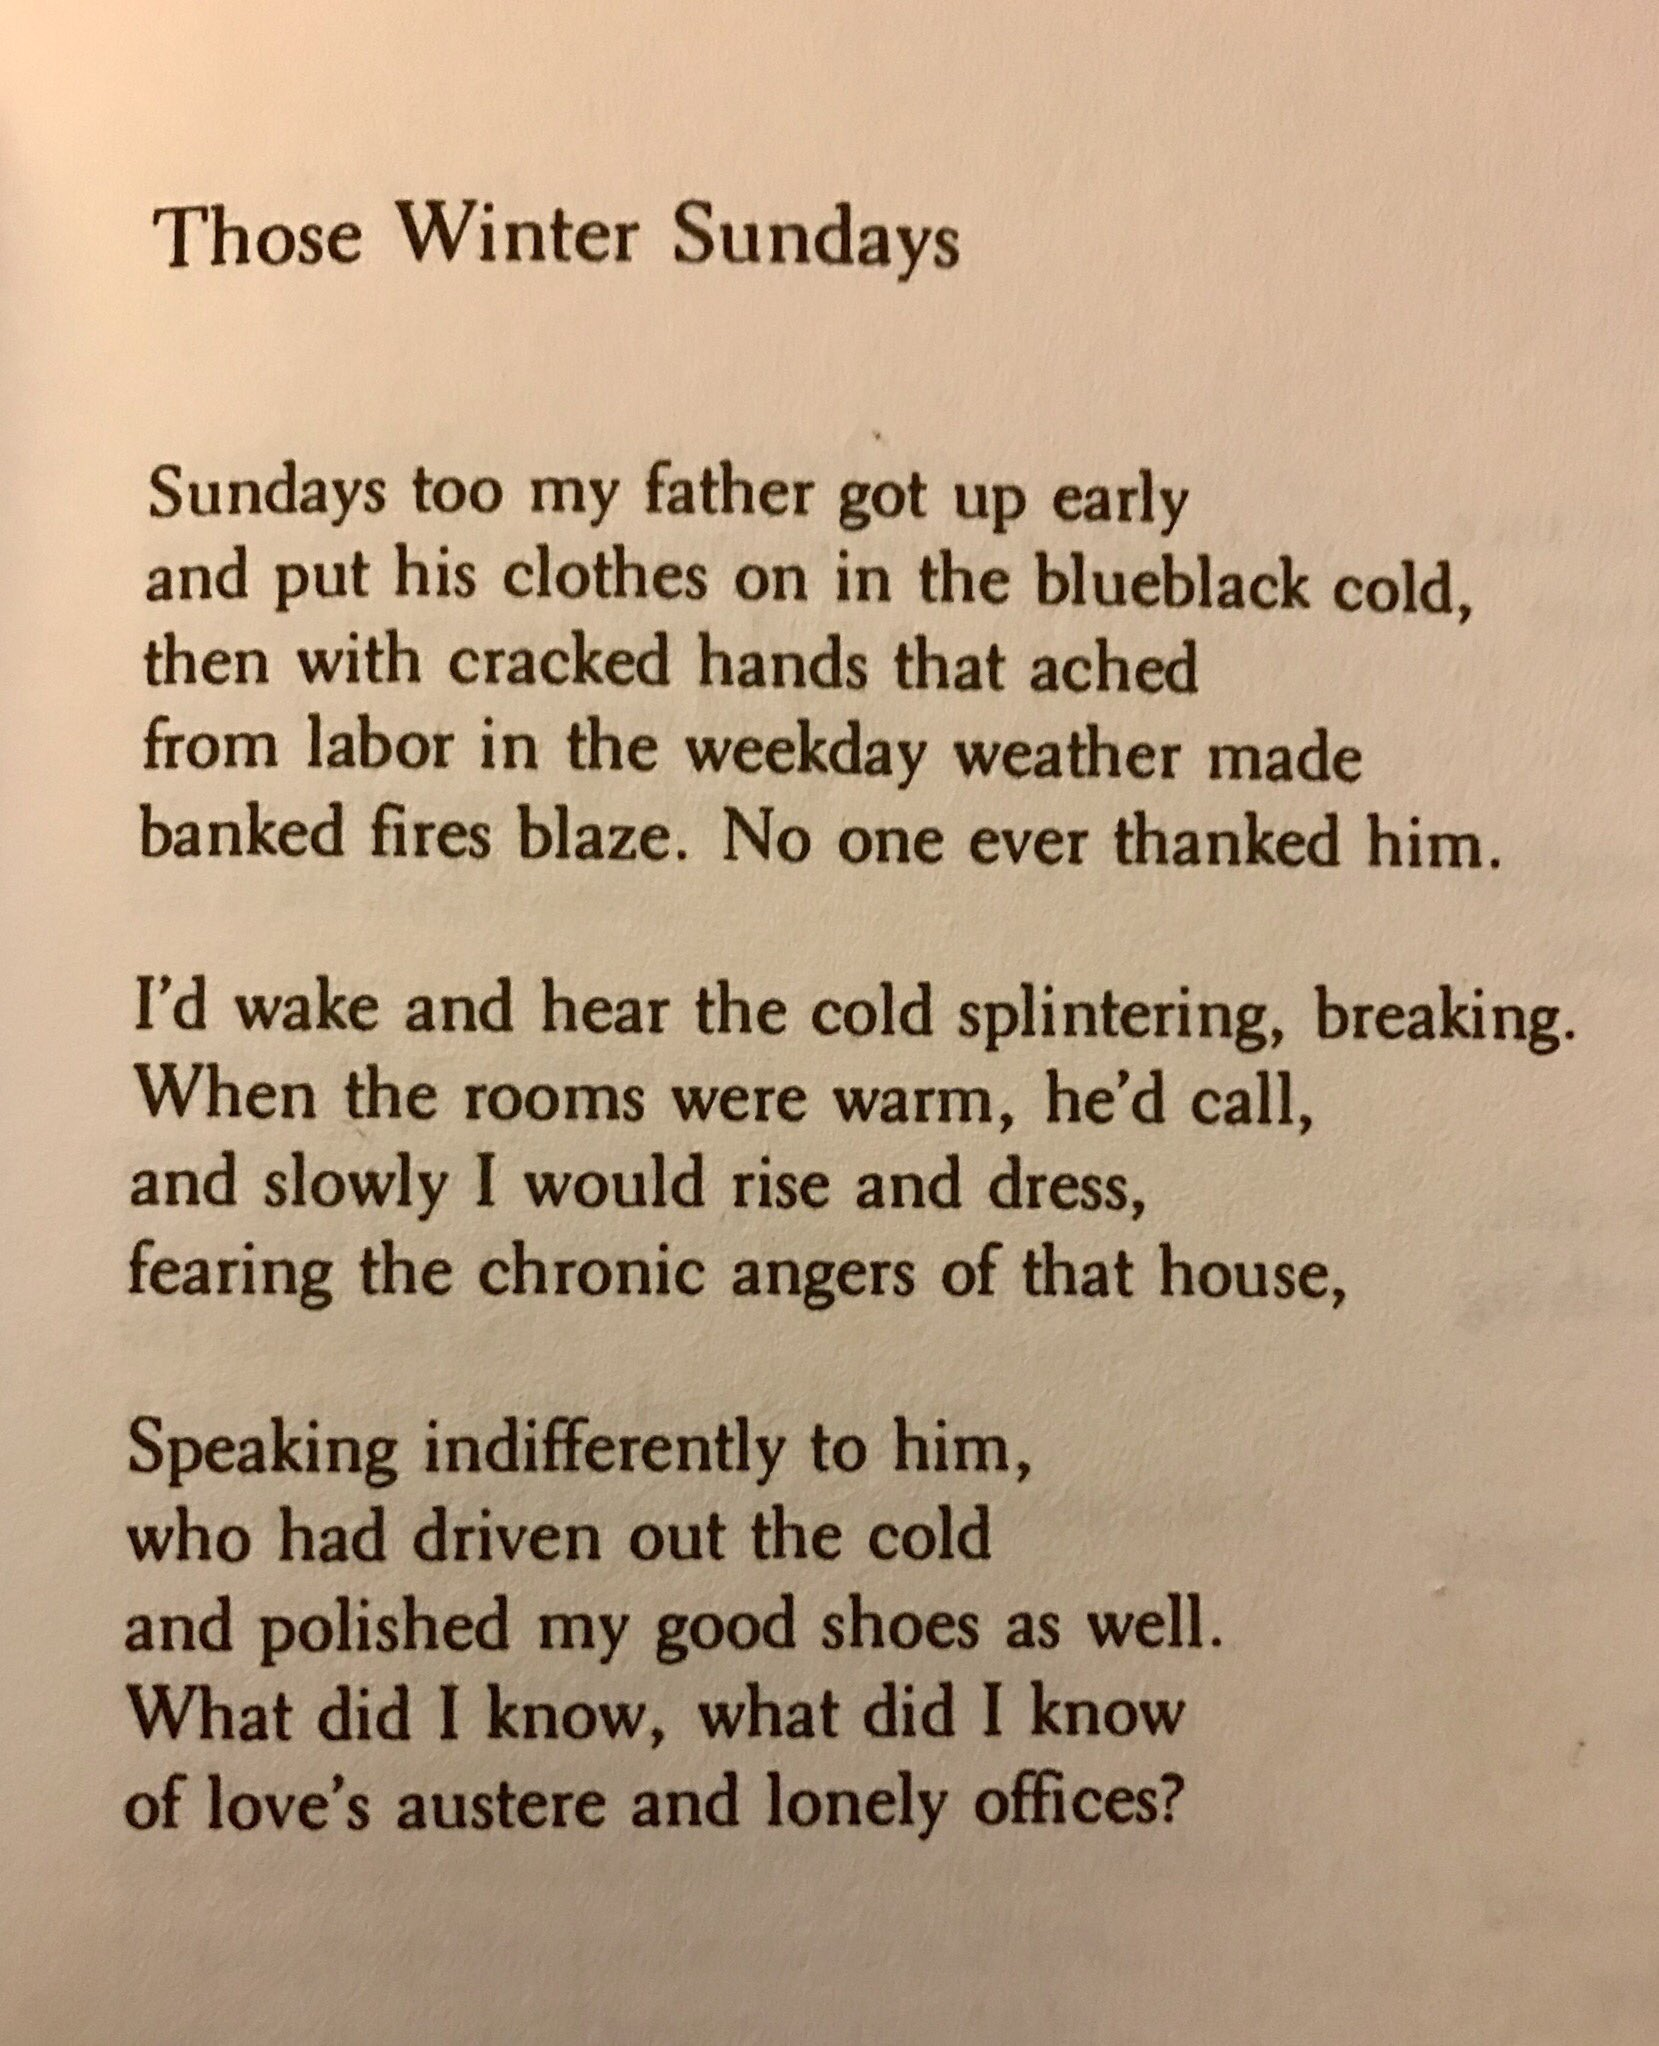 those winter sundays by robert hayden pdf